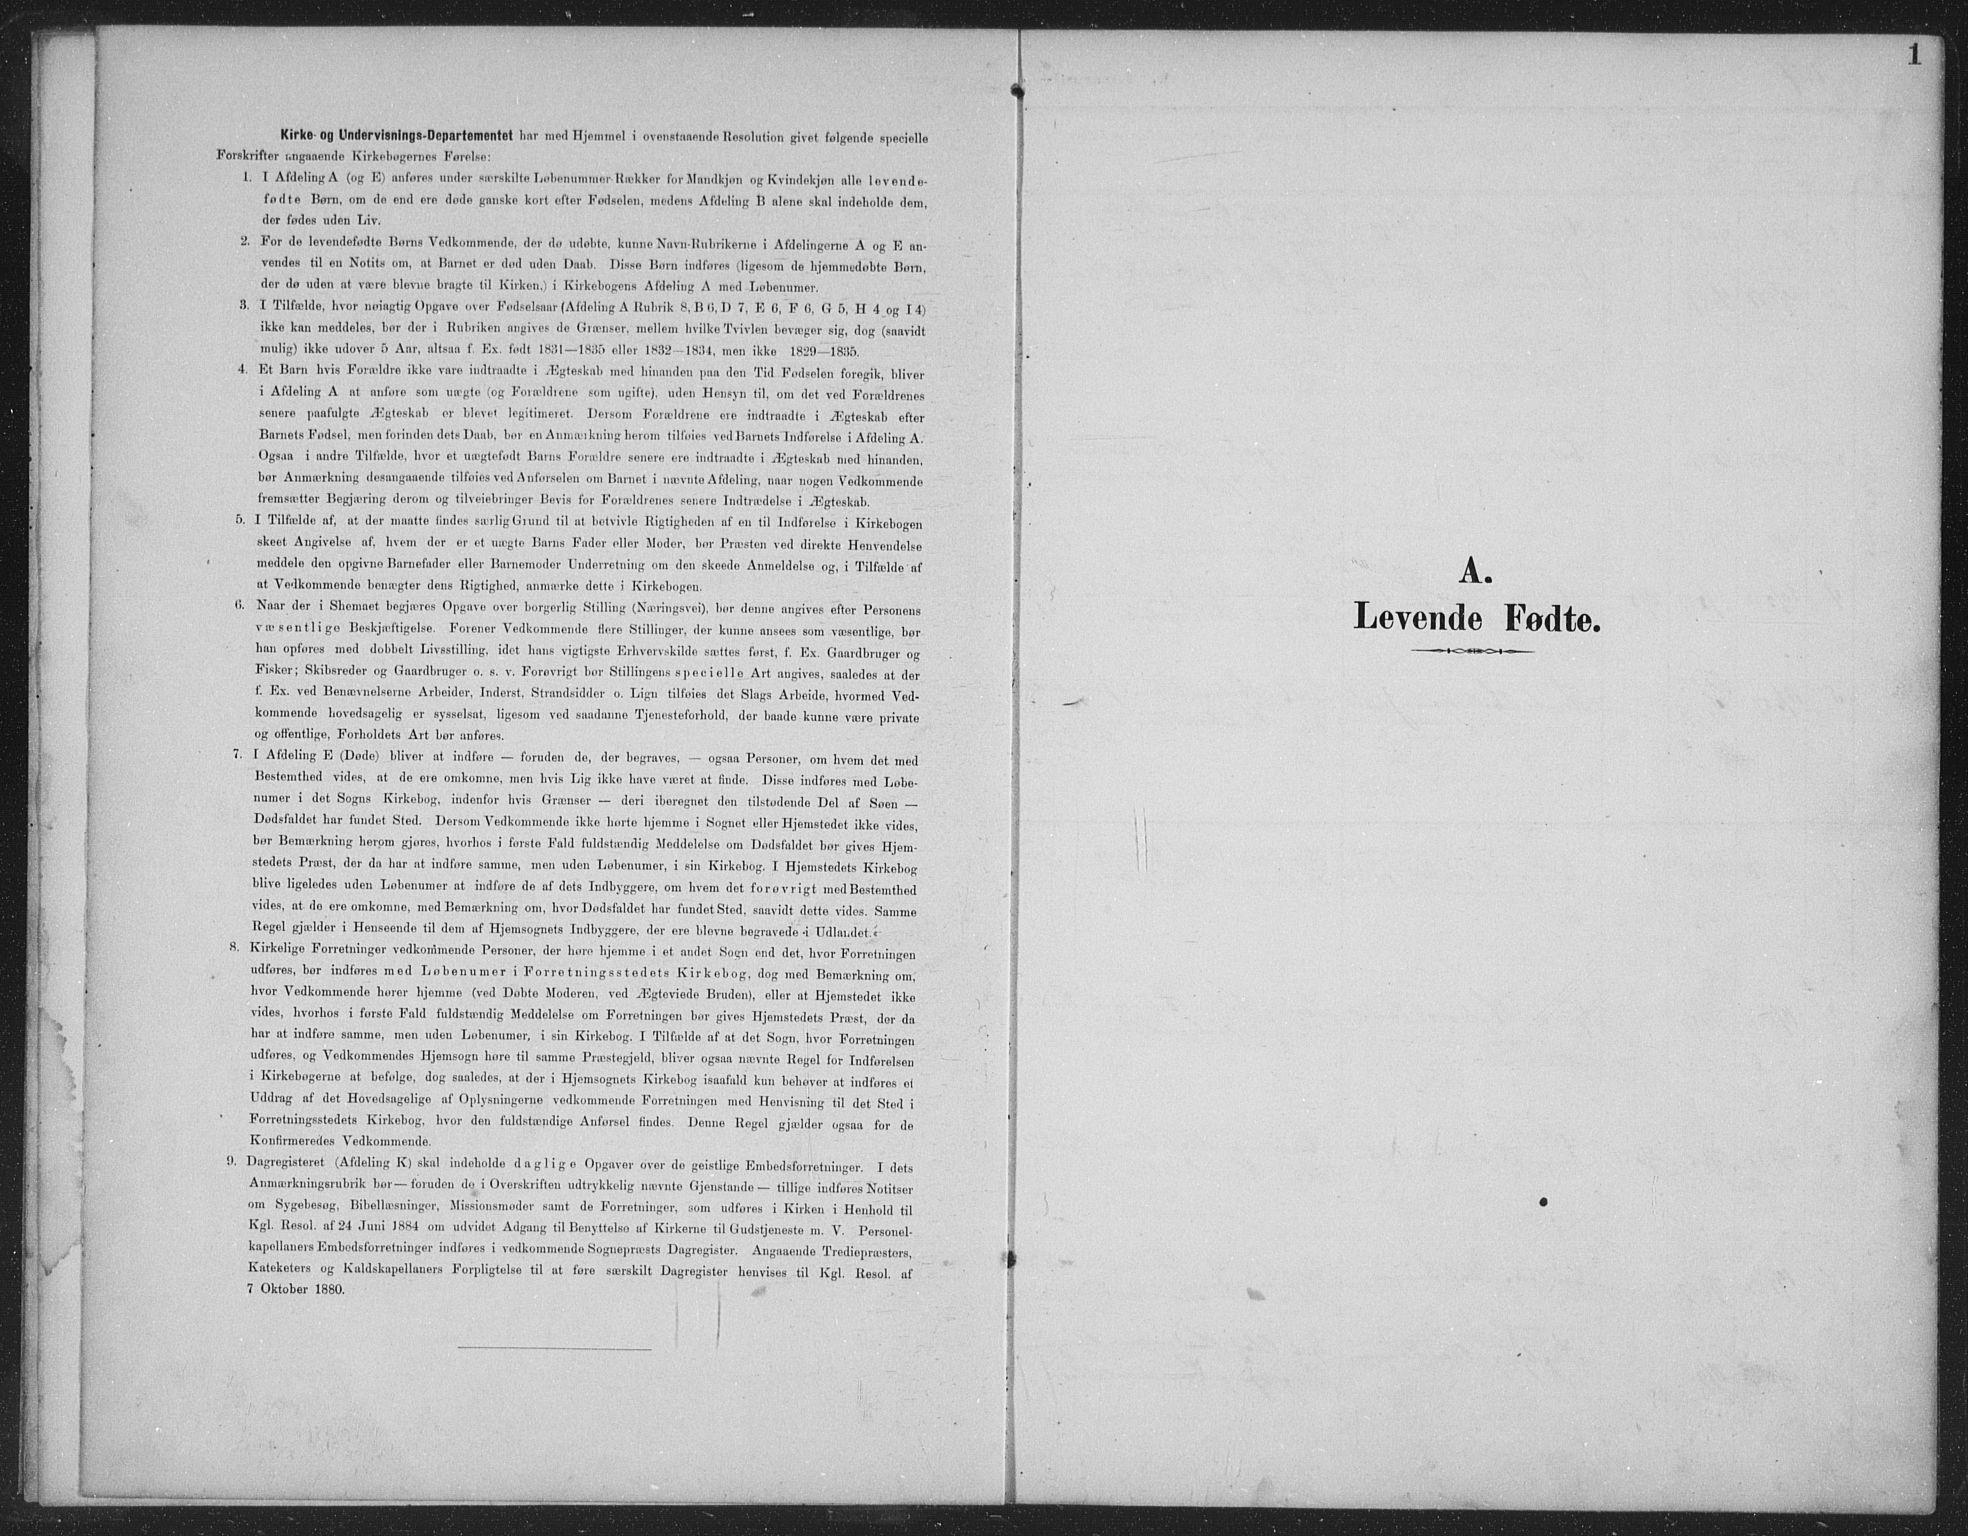 SAKO, Seljord kirkebøker, G/Gc/L0003: Klokkerbok nr. III 3, 1887-1926, s. 1